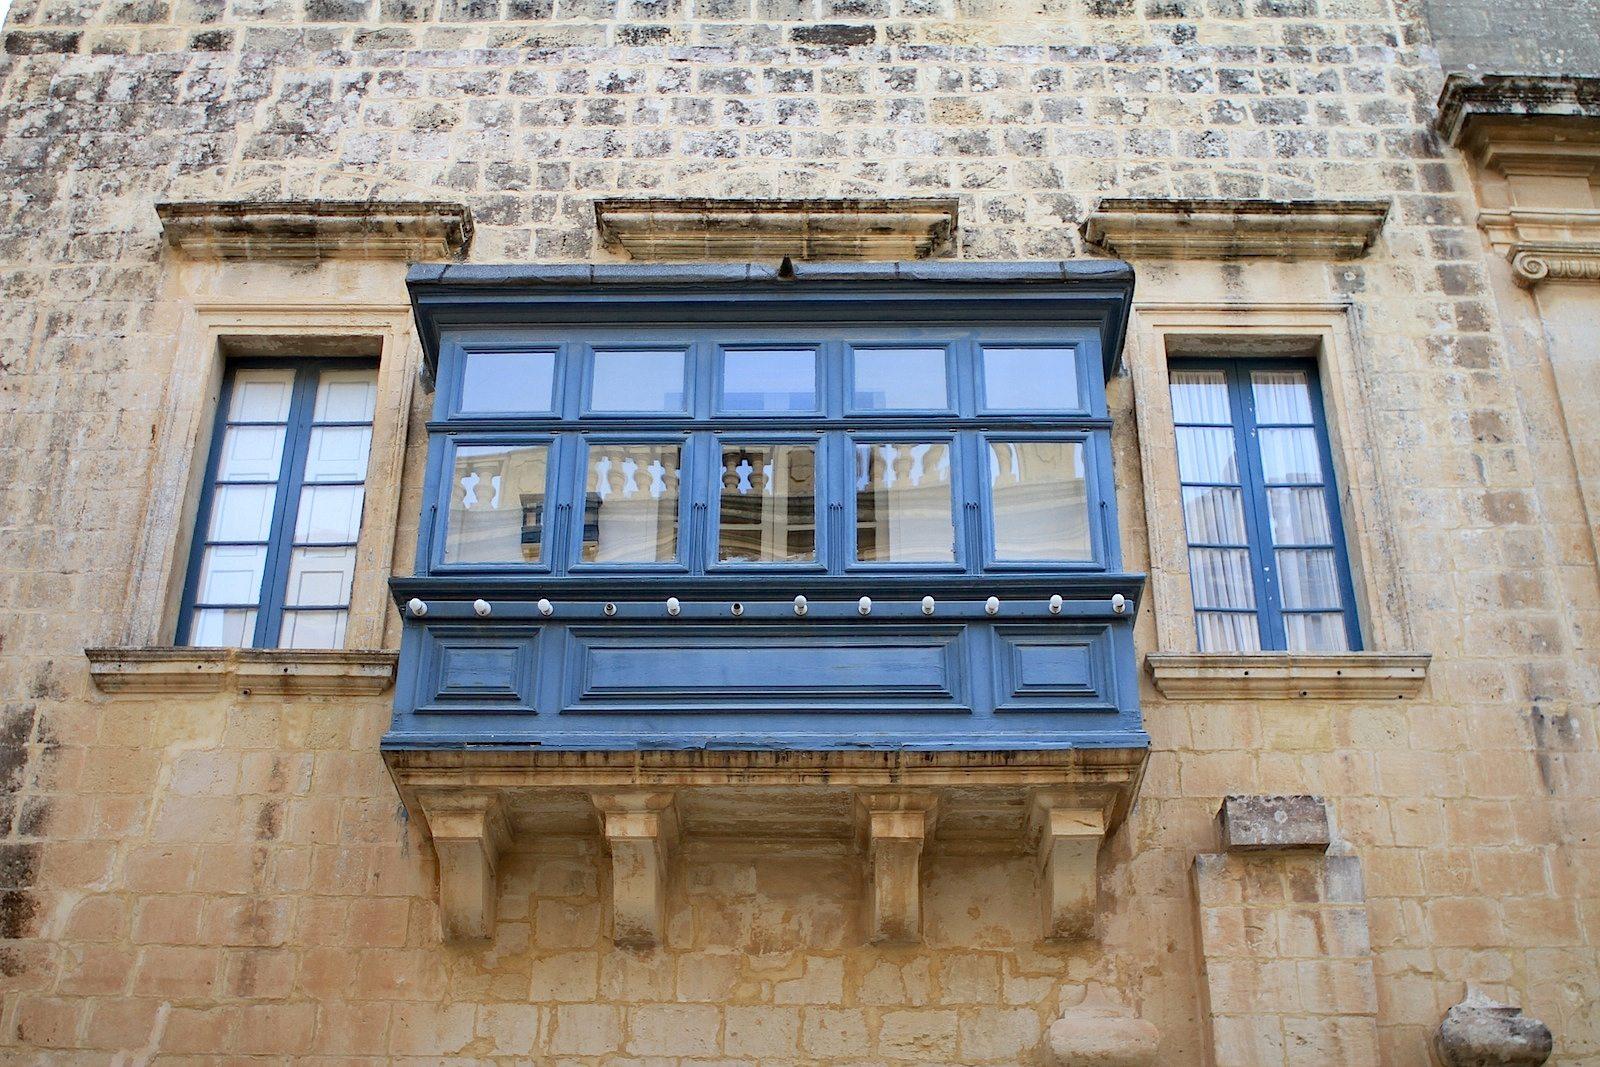 .  Gallarija in der Mittelalter-Stadt Mdina